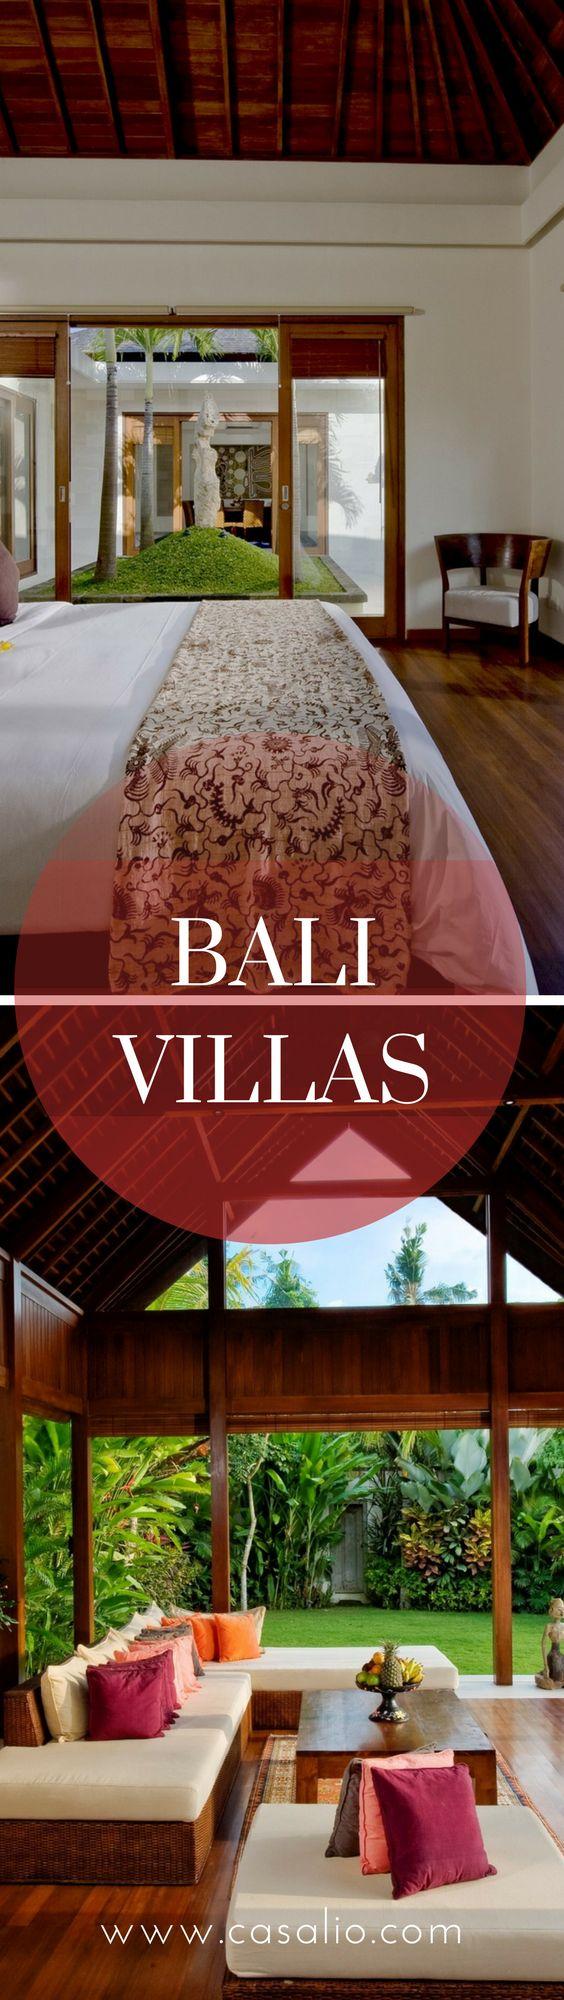 A Collection of the Best Holiday Villas in Bali - www.casalio.com - #bali #sabavillas #vacation #holiday #luxuryvillas #luxurytravel #travel #reisen #ferien #urlaub